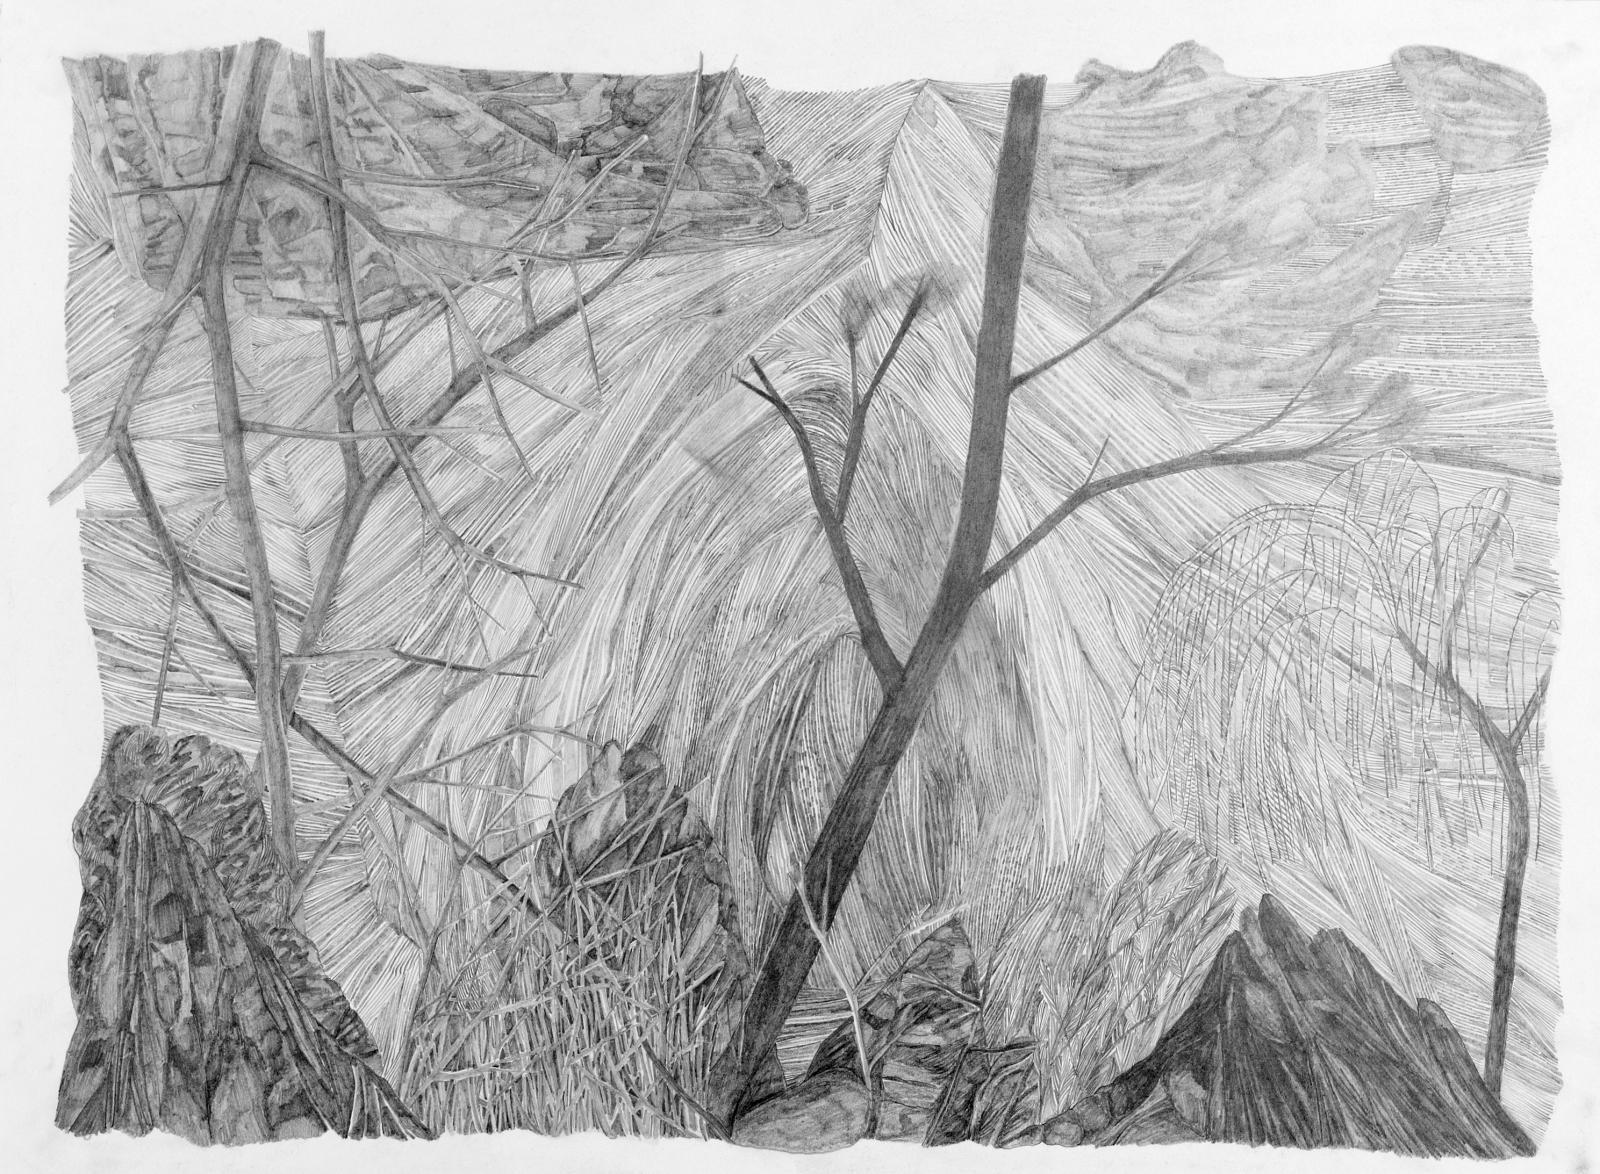 Eva Jospin, Sans titre, 2014, dessin 4, détail. © Eva Jospin courtesy Noirmontartproduction